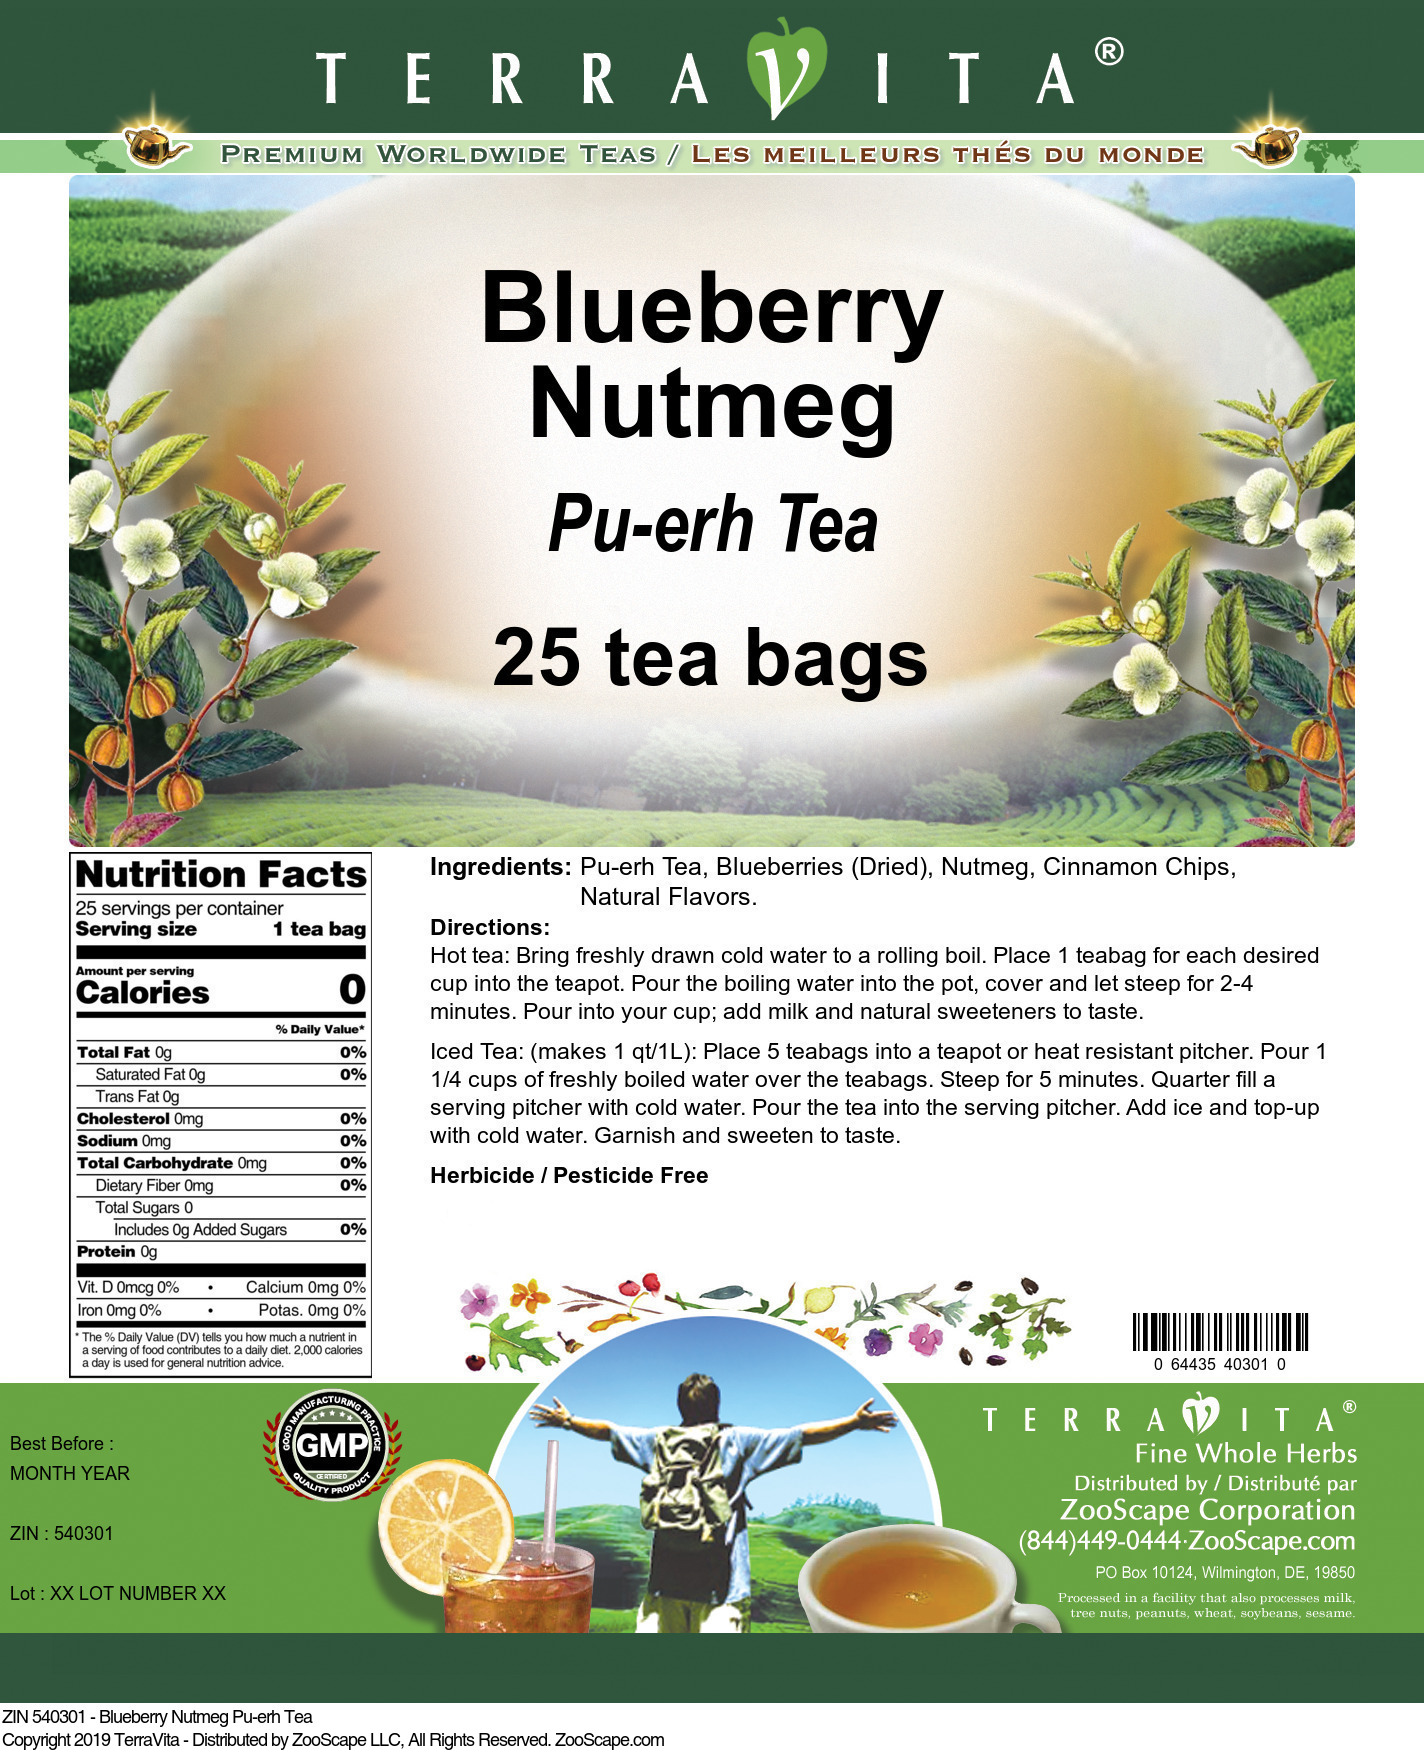 Blueberry Nutmeg Pu-erh Tea